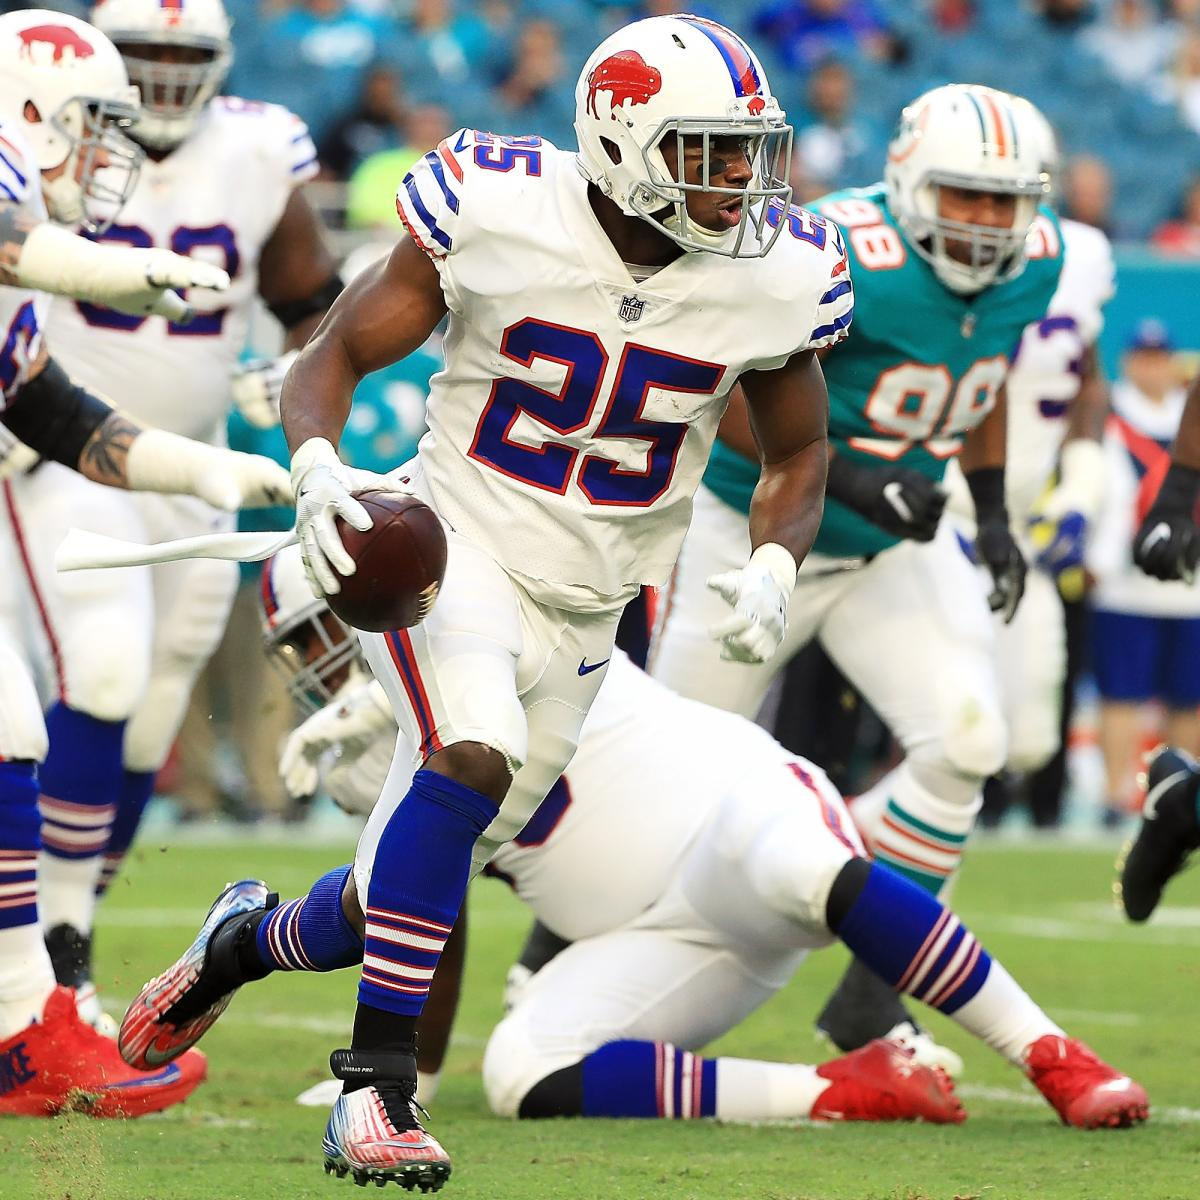 NFL Wild Card Weekend 2018: TV Schedule, Live Stream And